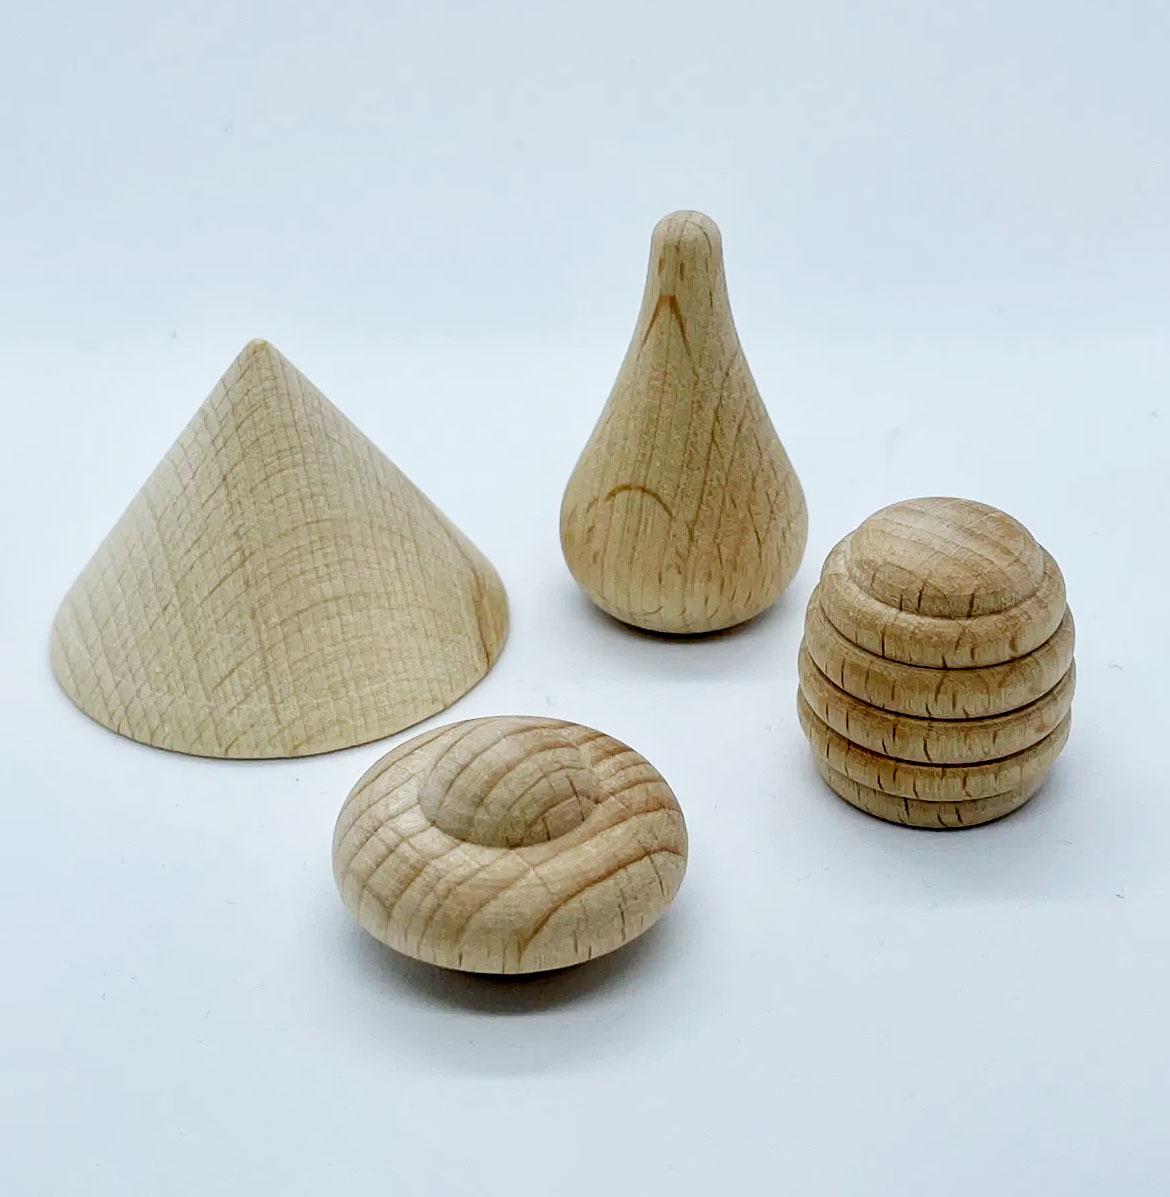 wooden mushrooms - play